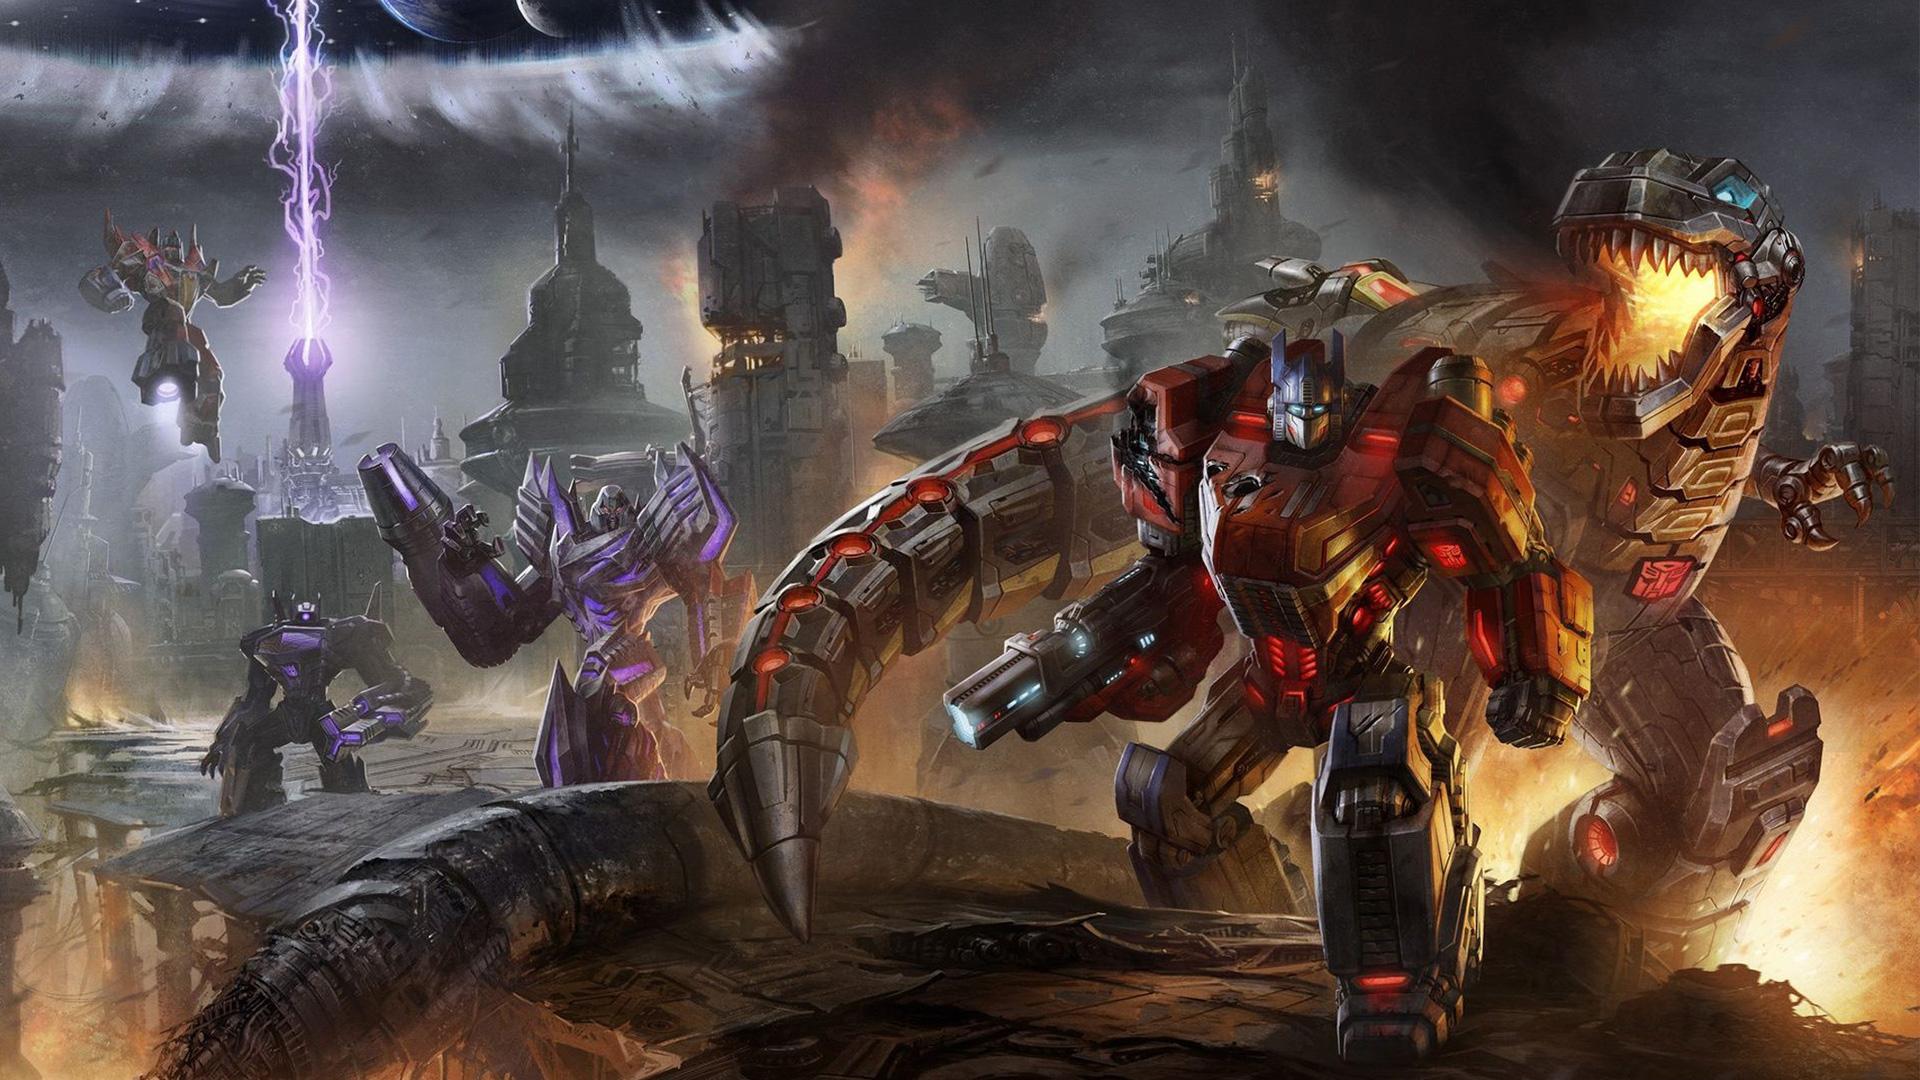 Transformers: Fall of Cybertron Wallpaper in 1920x1080